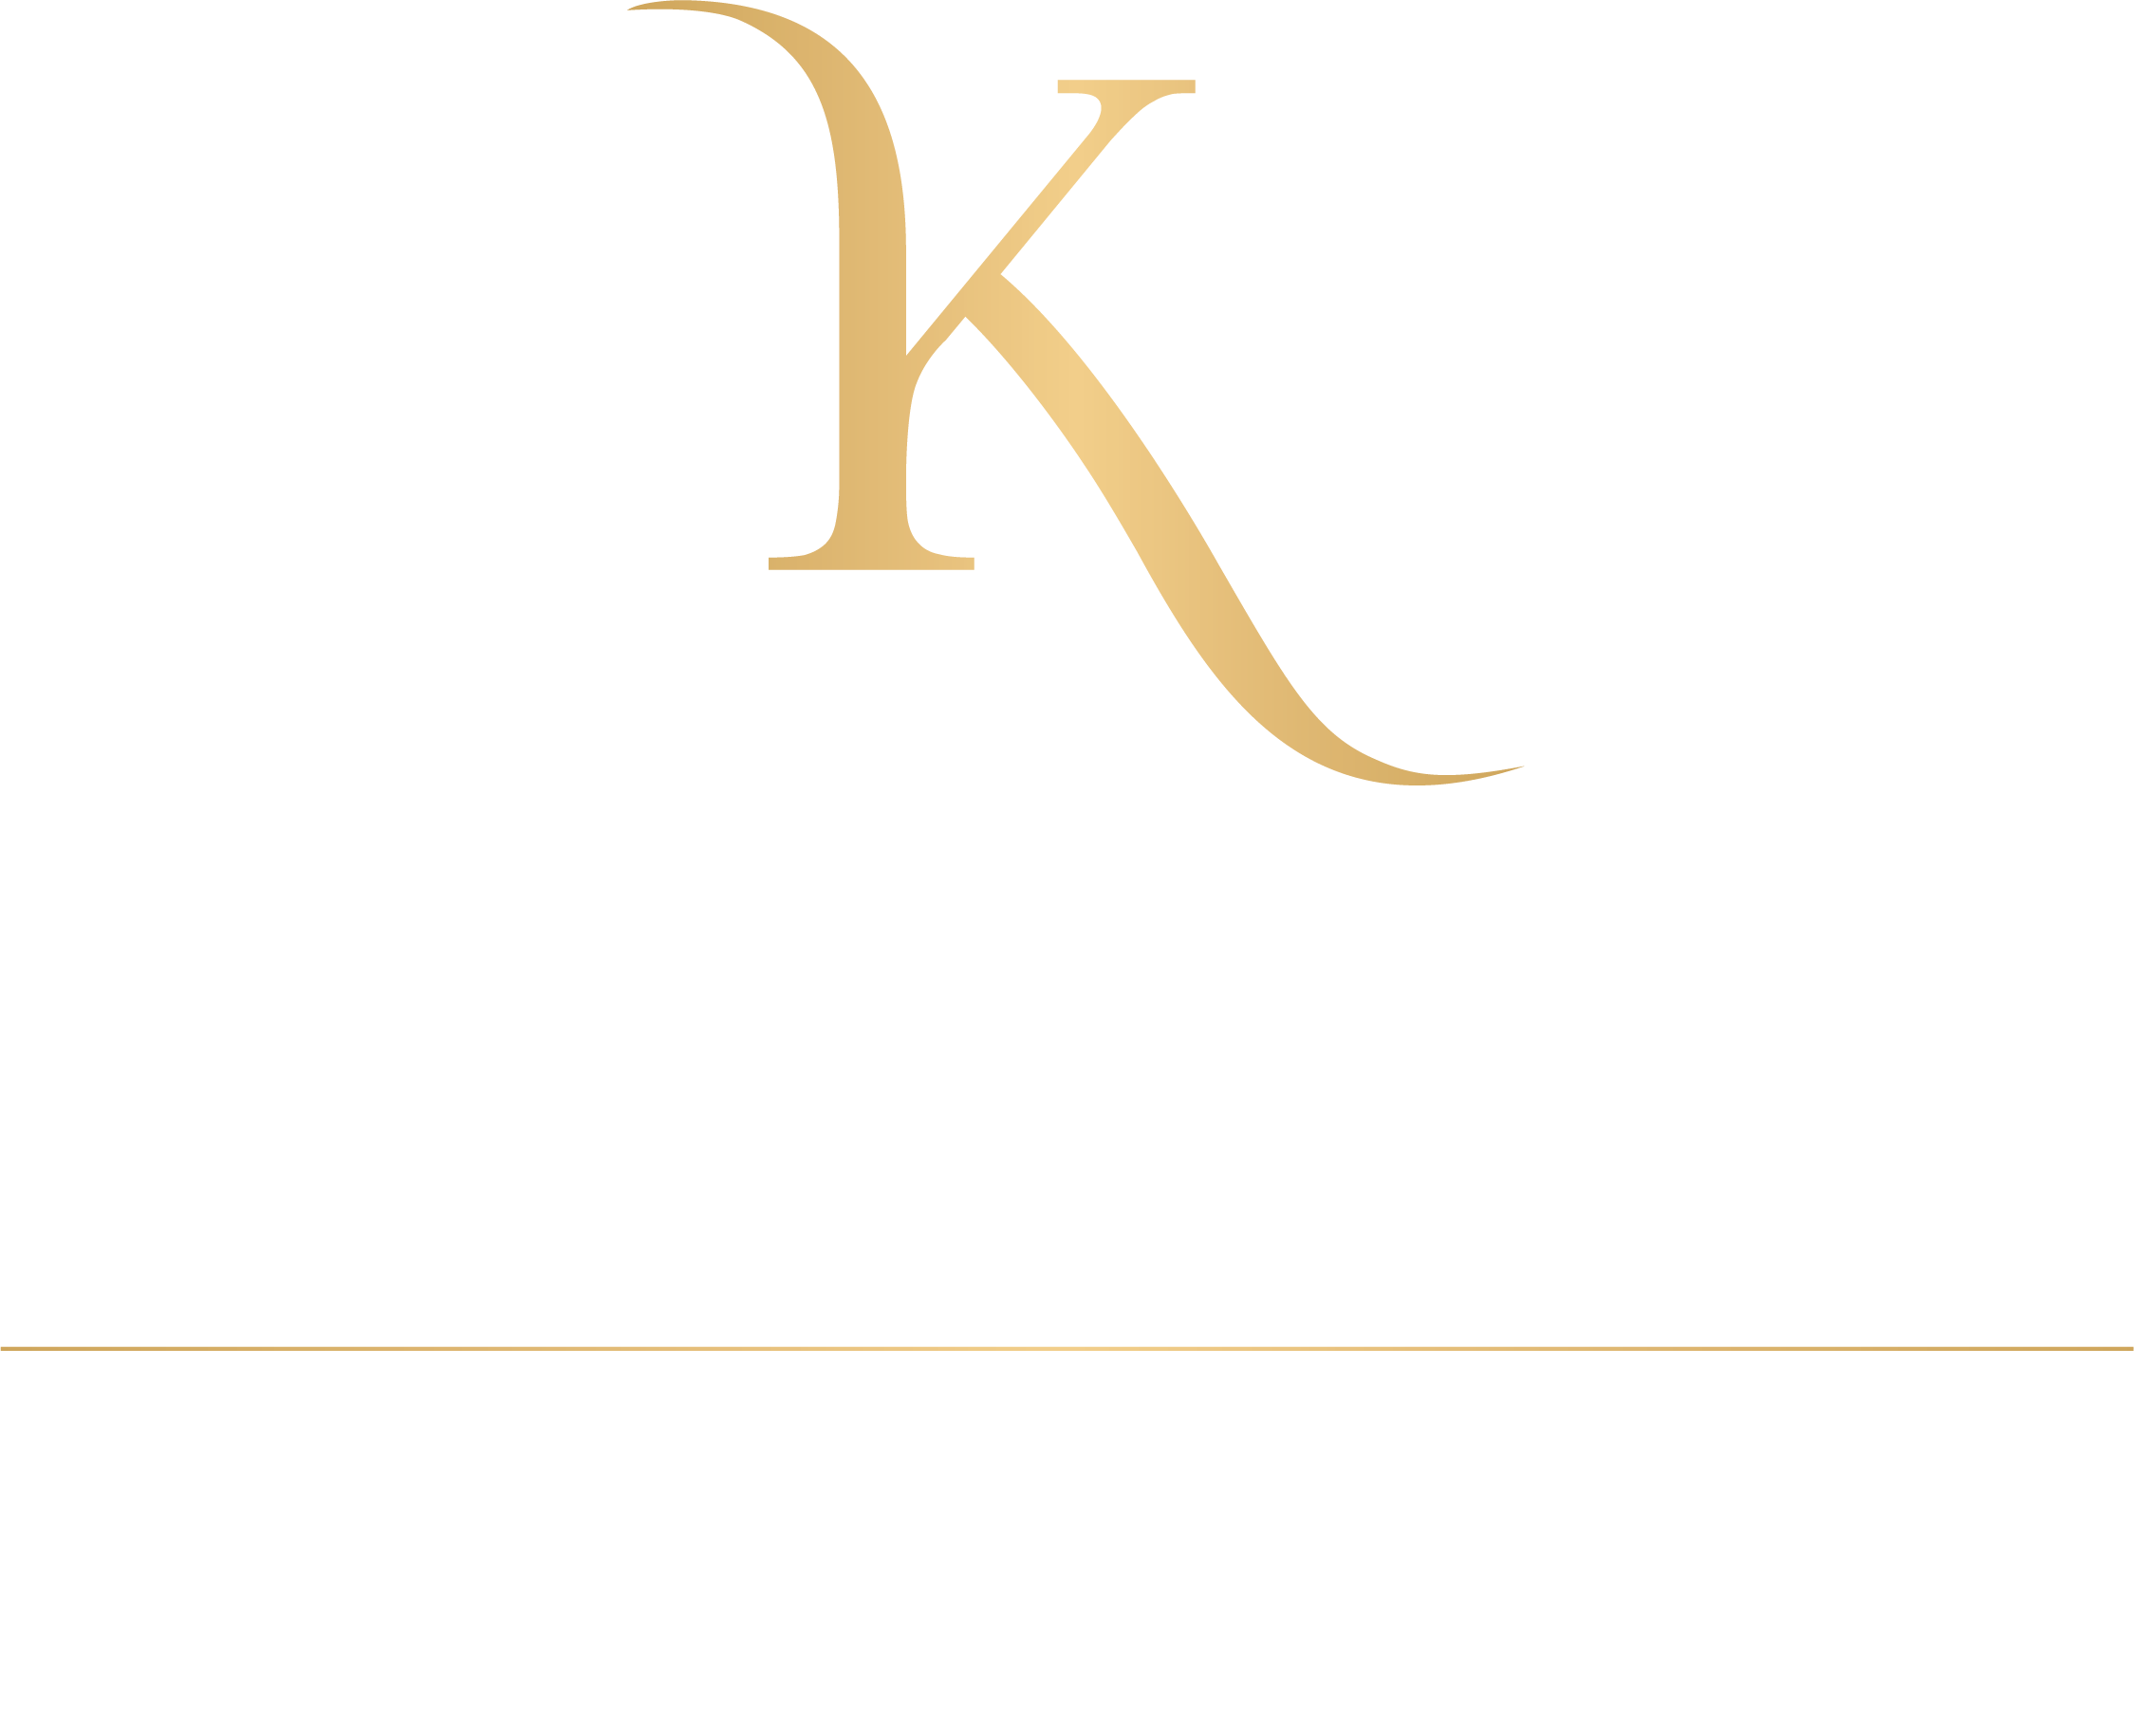 krona_k_Studio_W.png